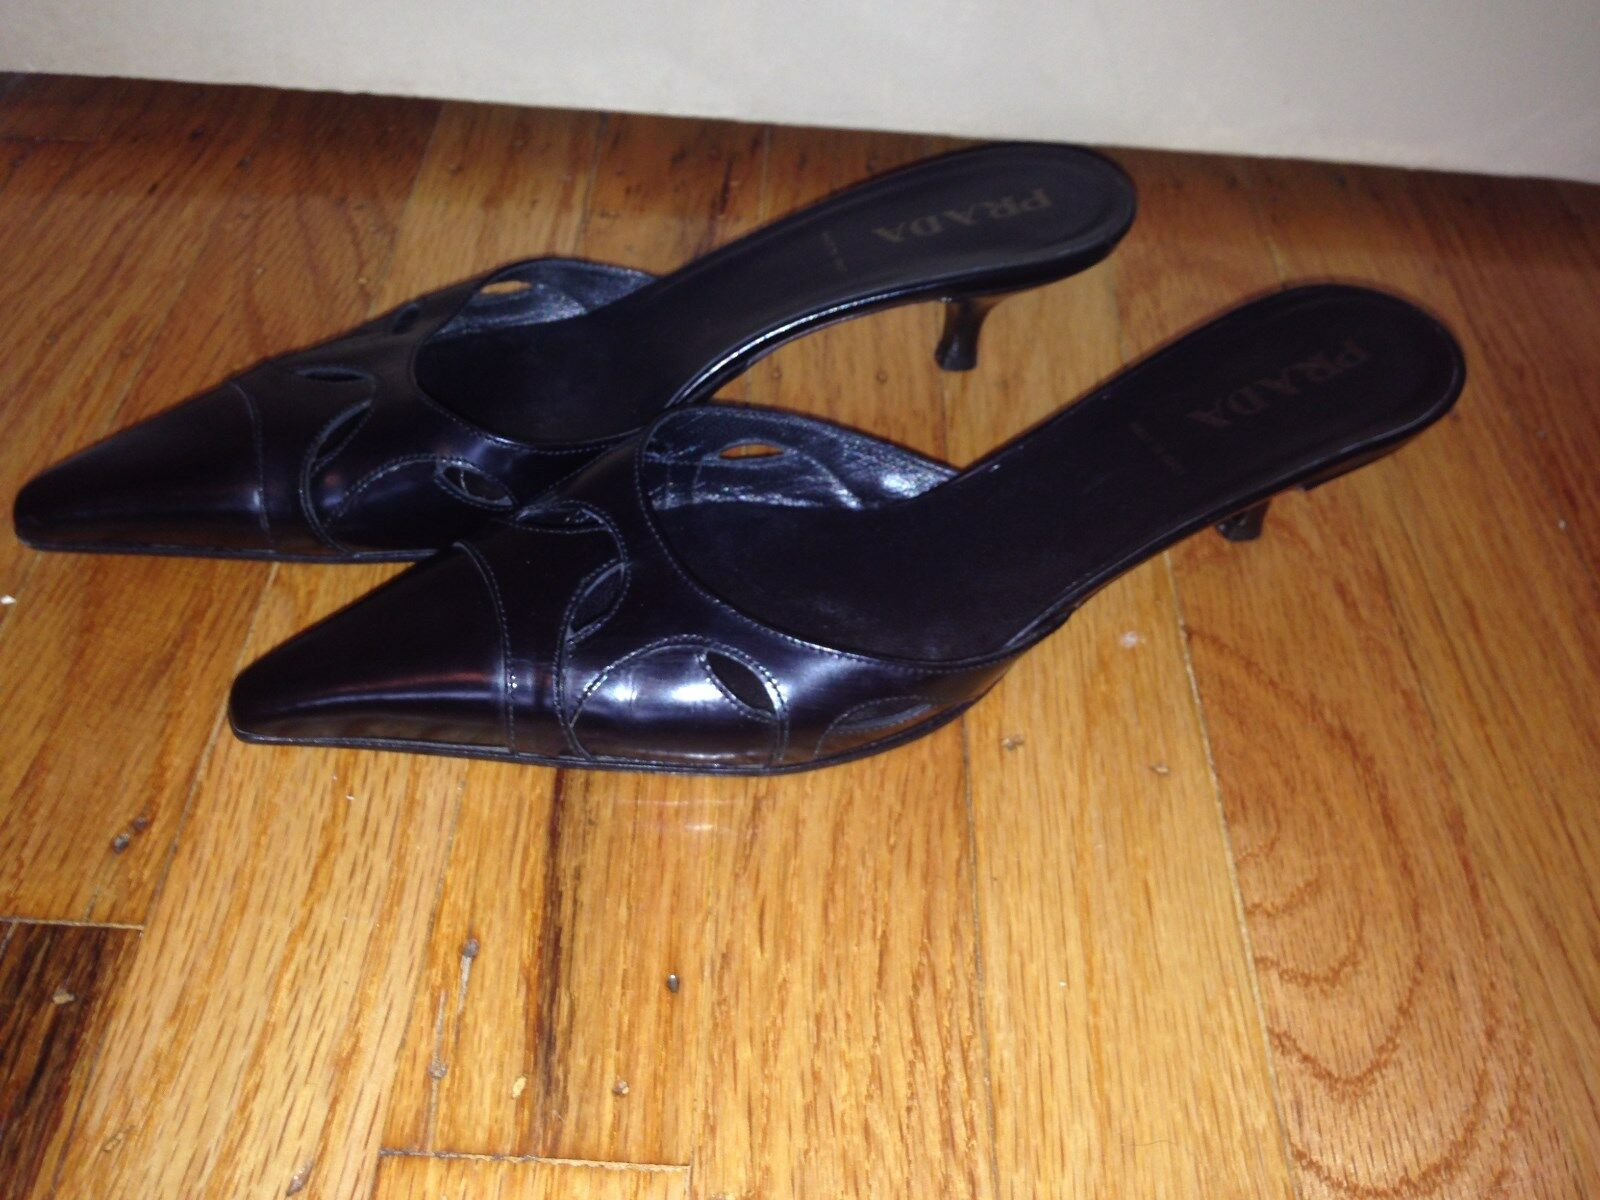 PRADA LADIES noir ITALY chaussures SANDALS Taille 37 (7 (7 (7 US) b0f9d0